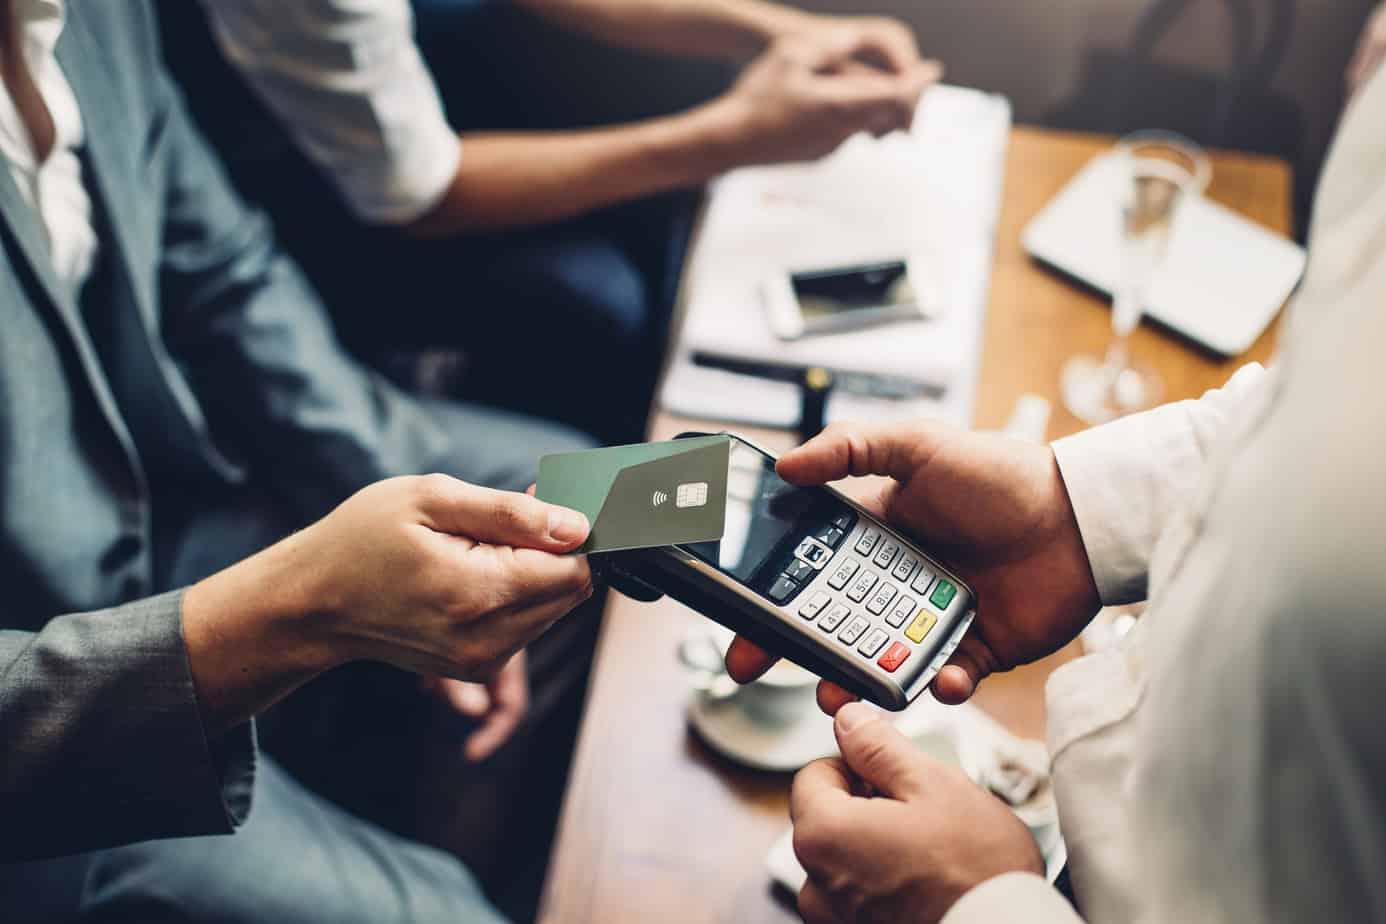 contactless-card-payment-74484201